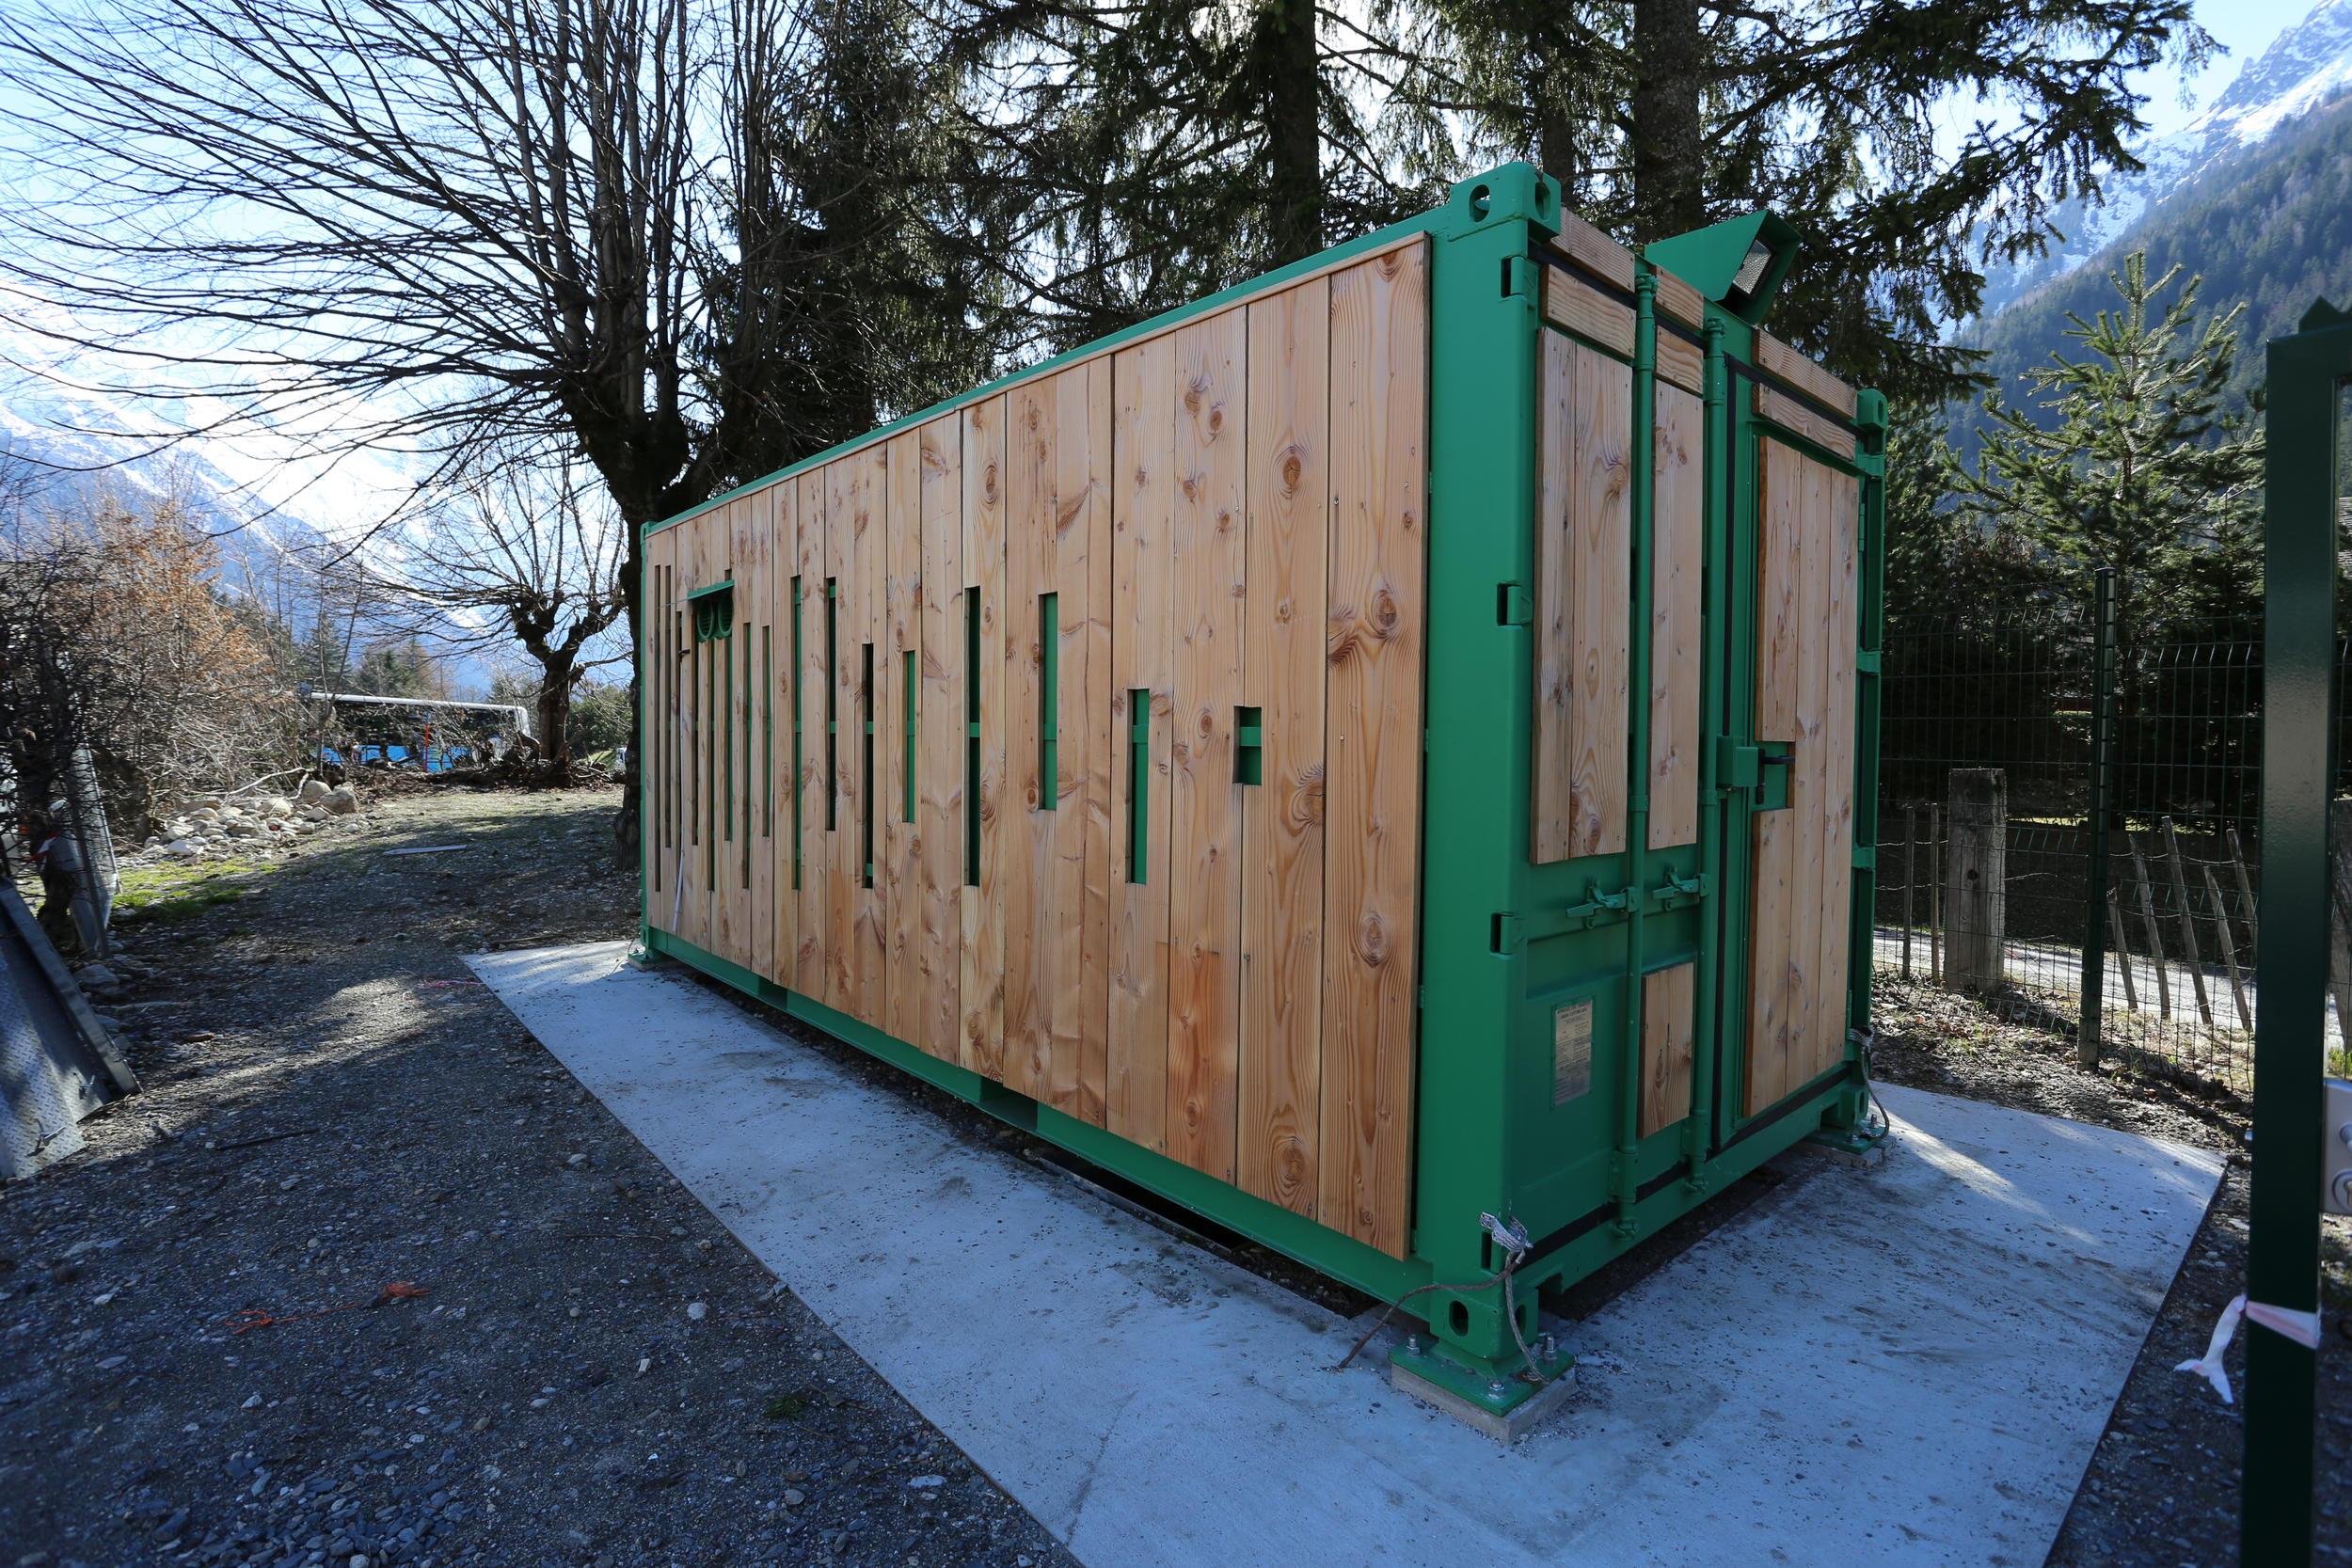 Green бетон купить бетон с доставкой москва цена